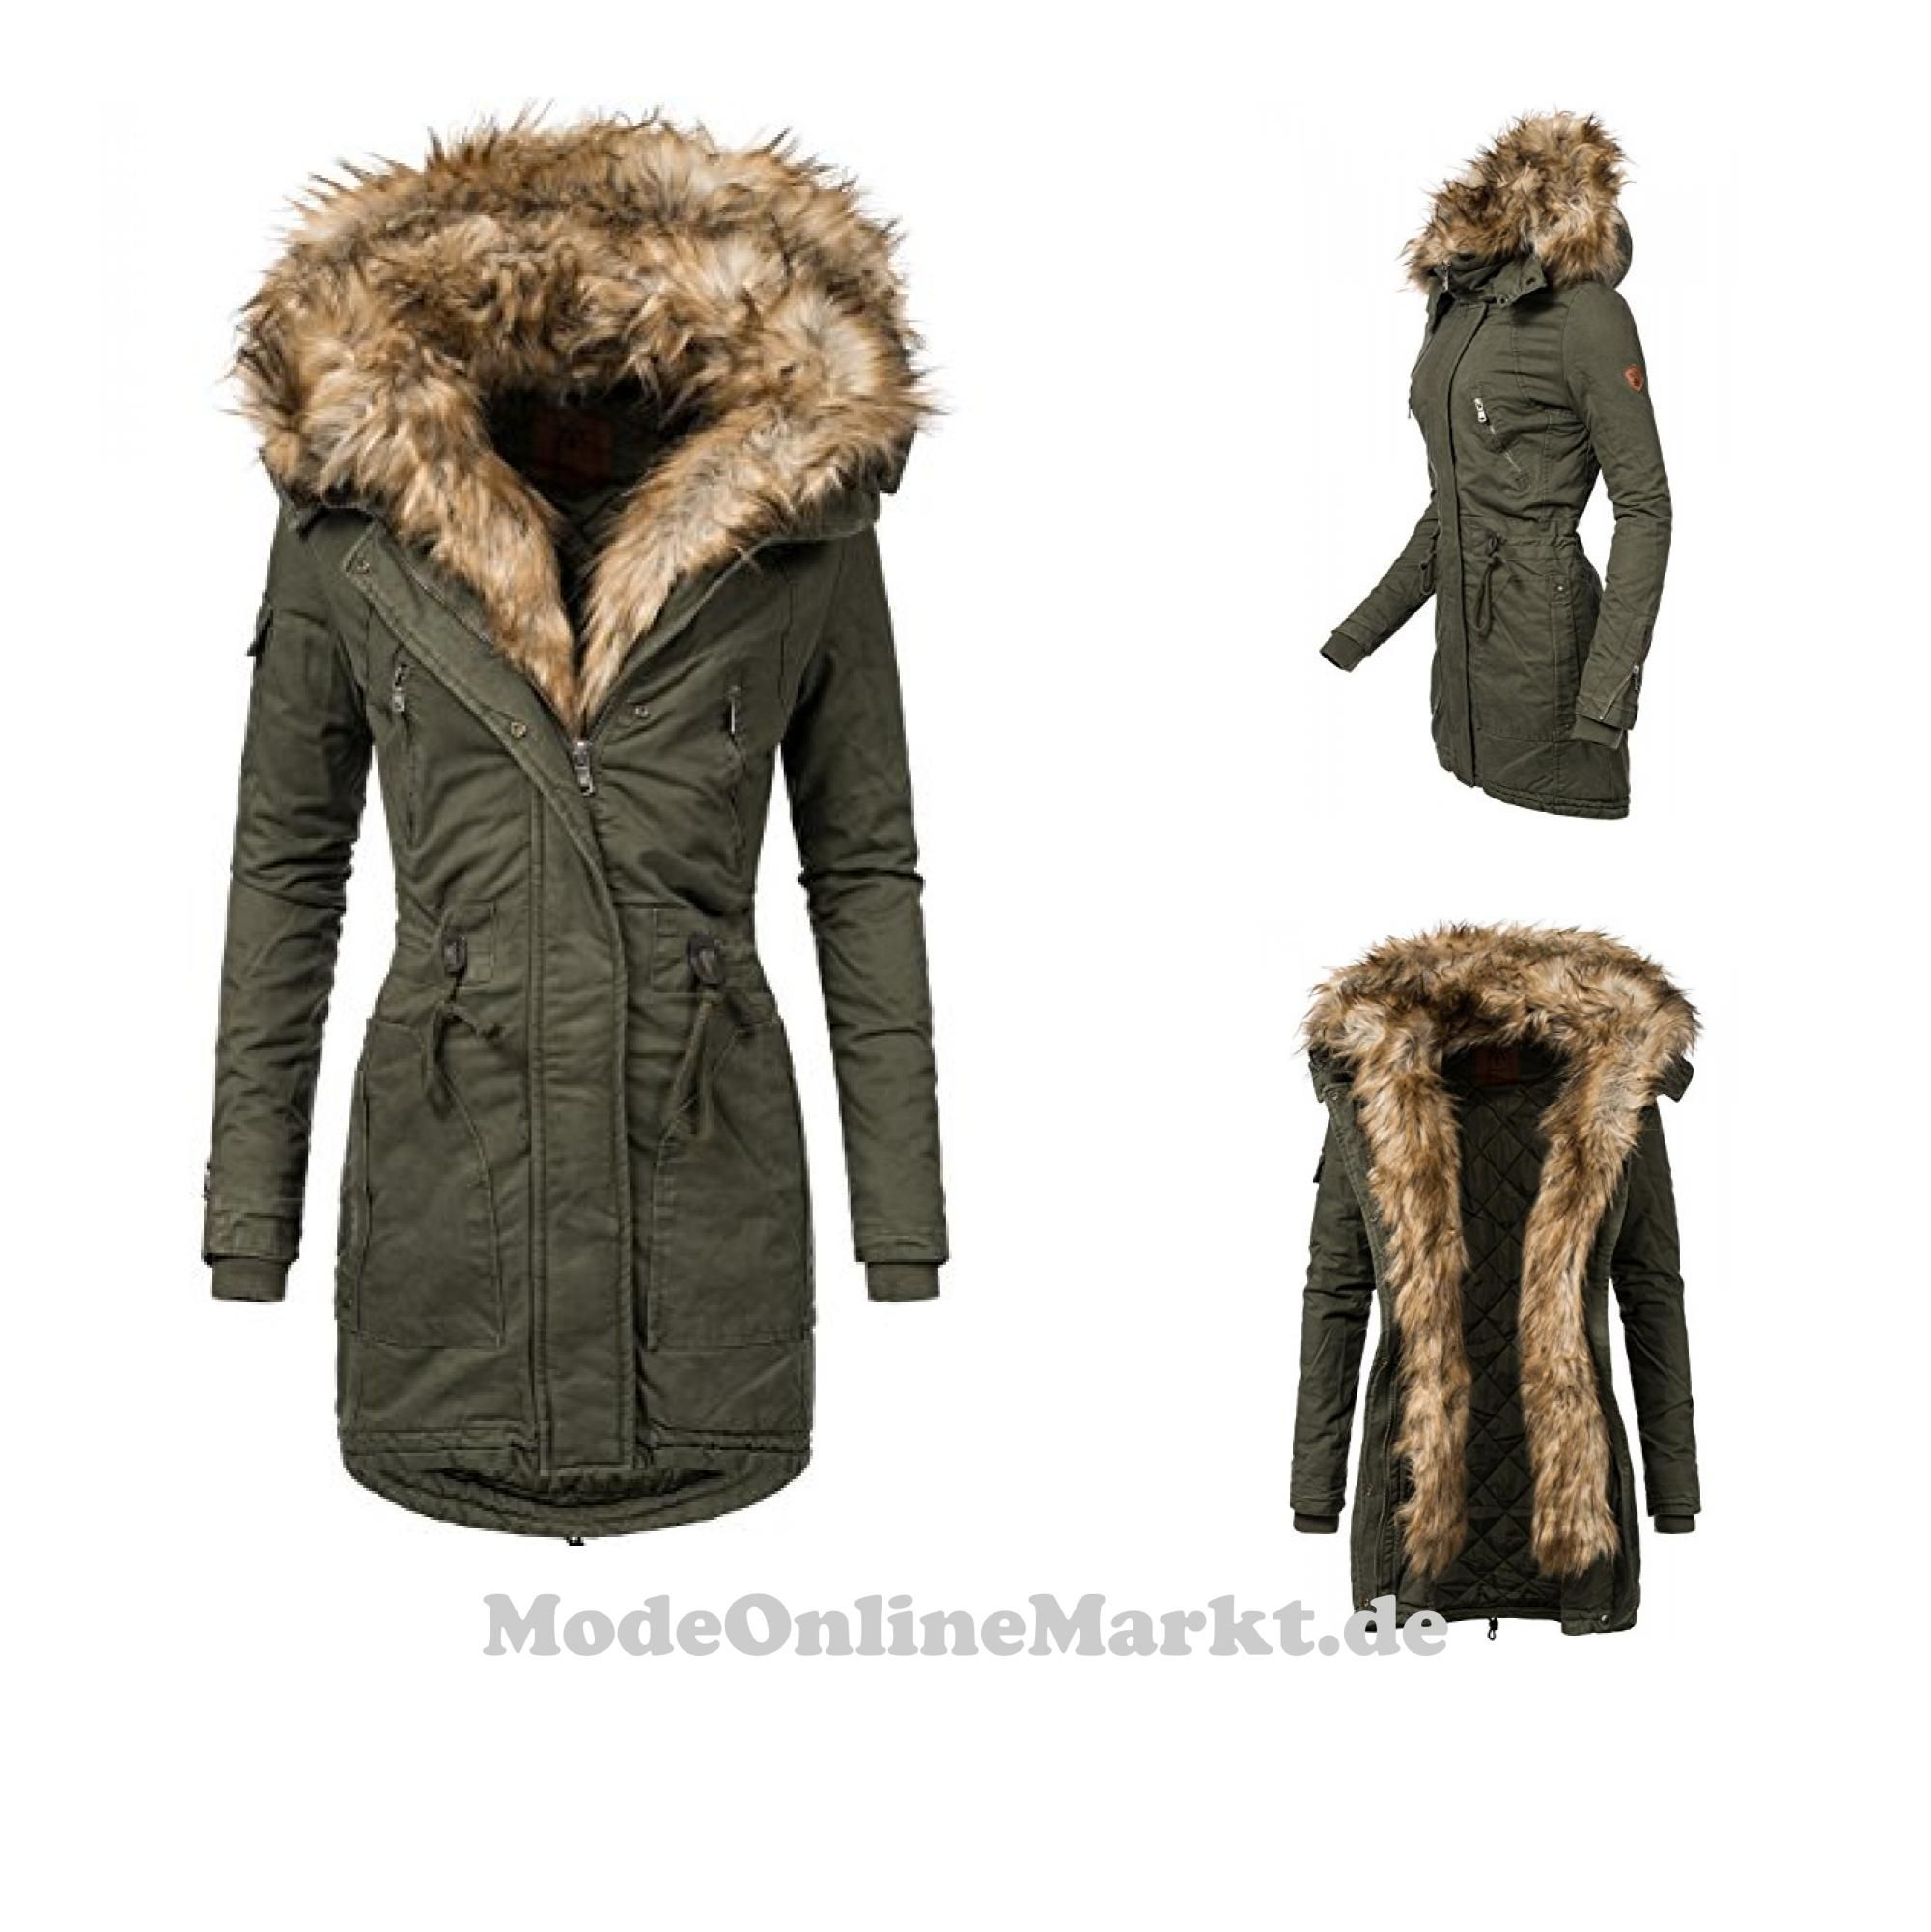 Peak Time Damen Jacke M385 Khaki Gr. 38: : Bekleidung